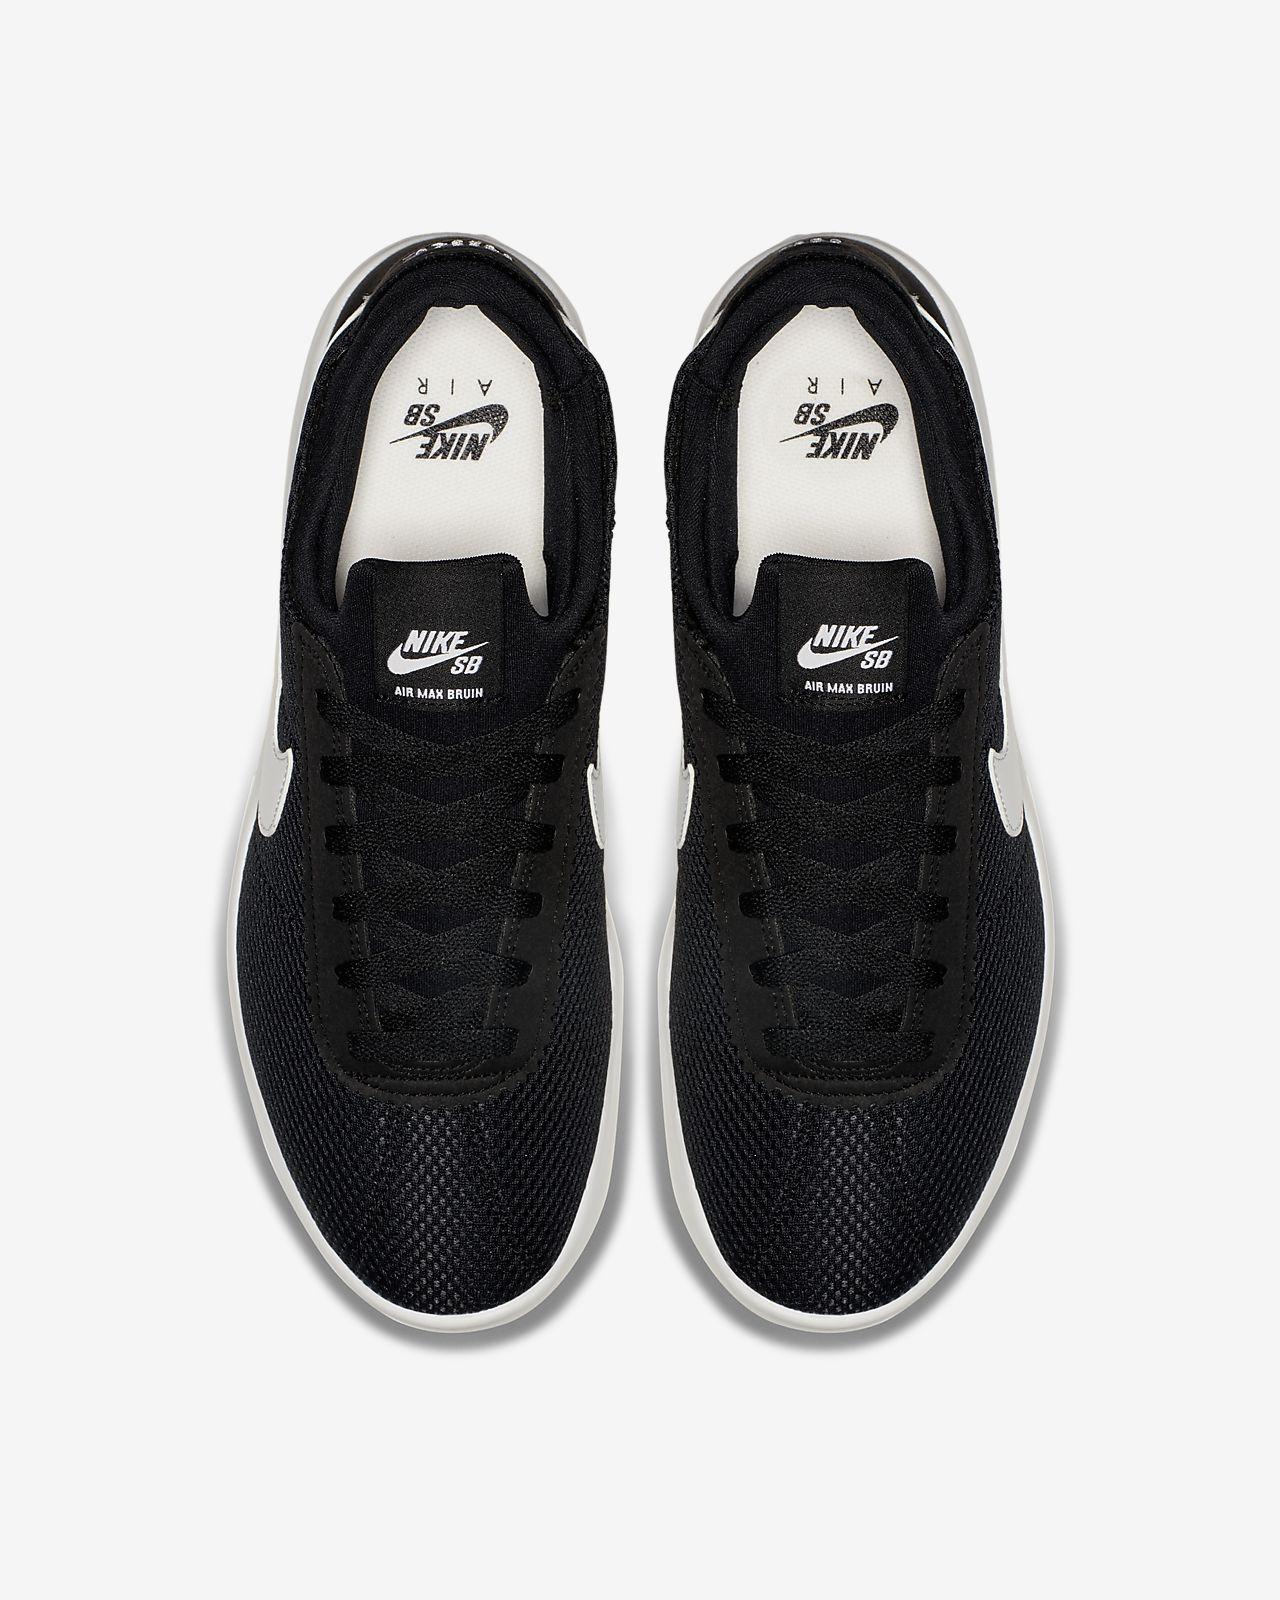 e1481fa5adfa10 Nike SB Air Max Bruin Vapor Men s Skate Shoe. Nike.com AU